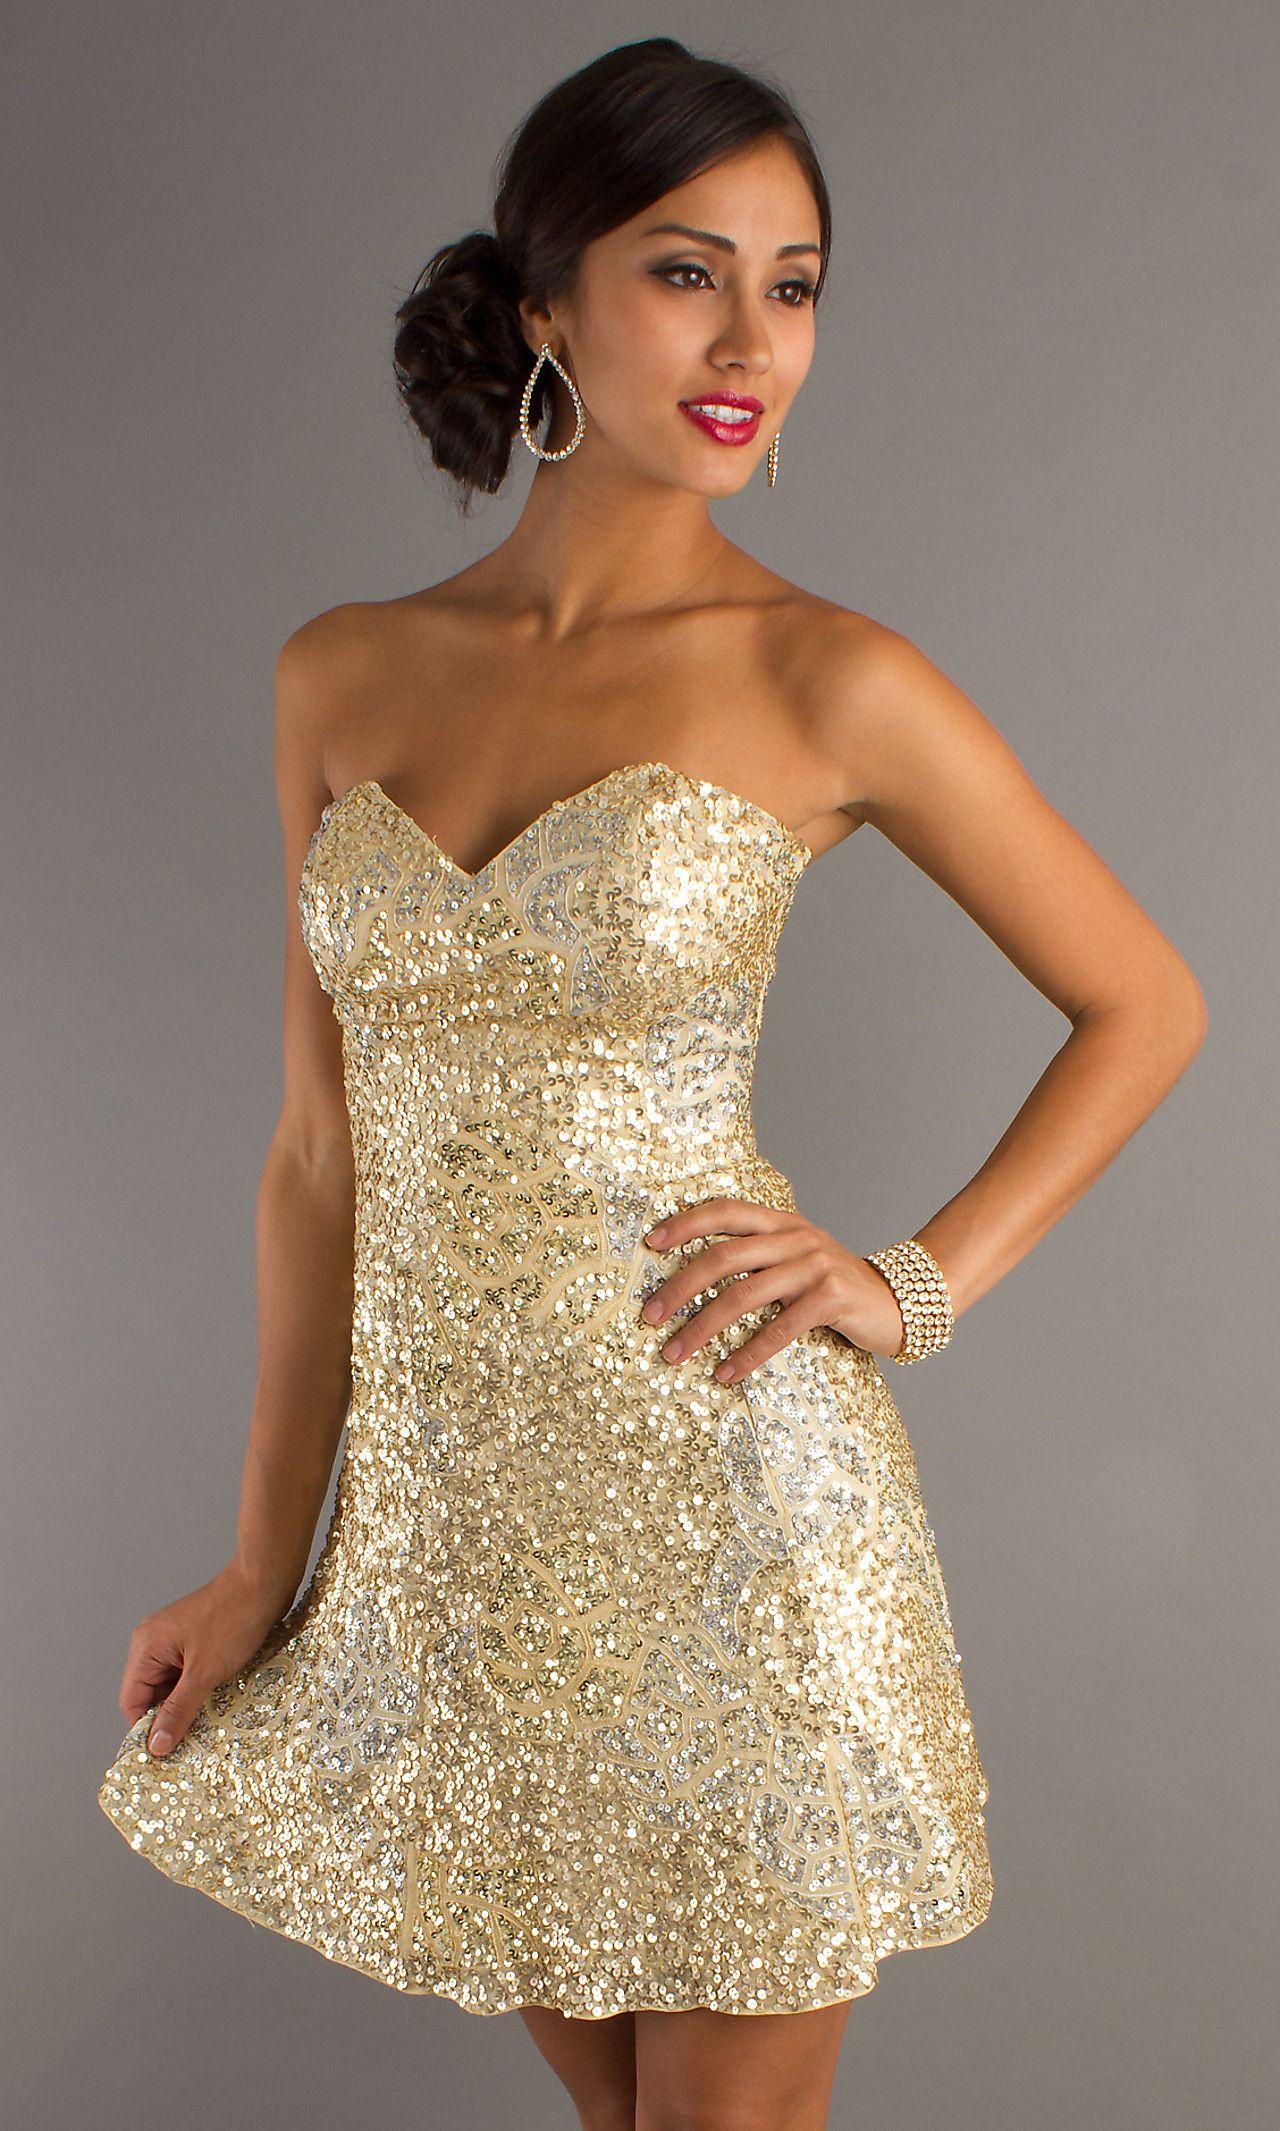 Gold Sequin Strapless Dress | Cocktail Dresses 2016